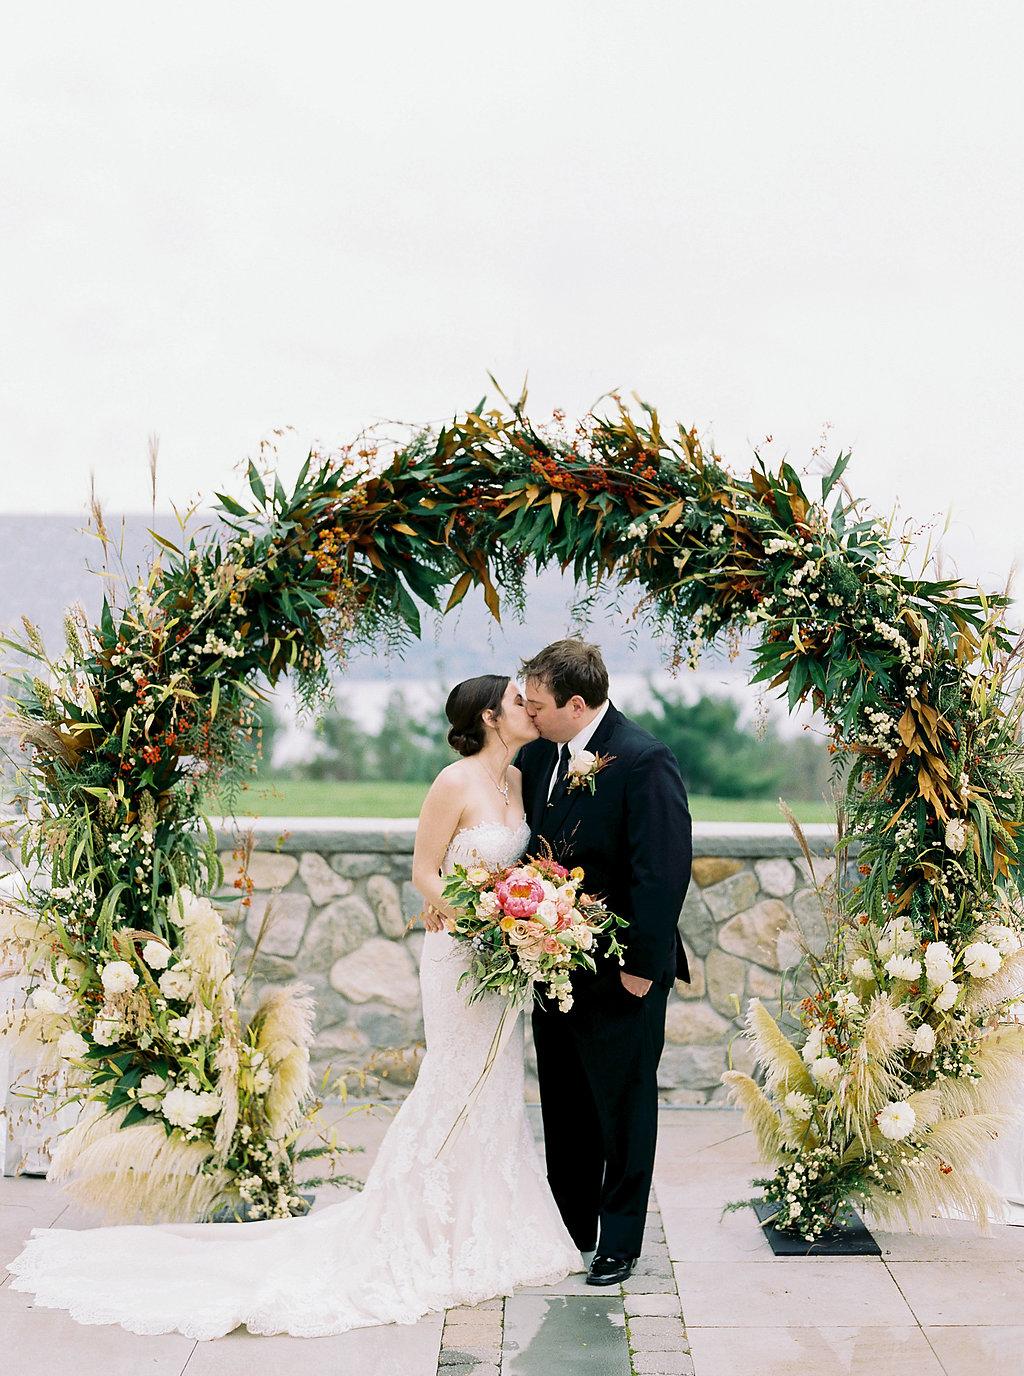 Alexandra-Elise-Photography-Ali-Reed-Nicole-Derek-Bristol-Harbour-Wedding-Highlights-034.jpg